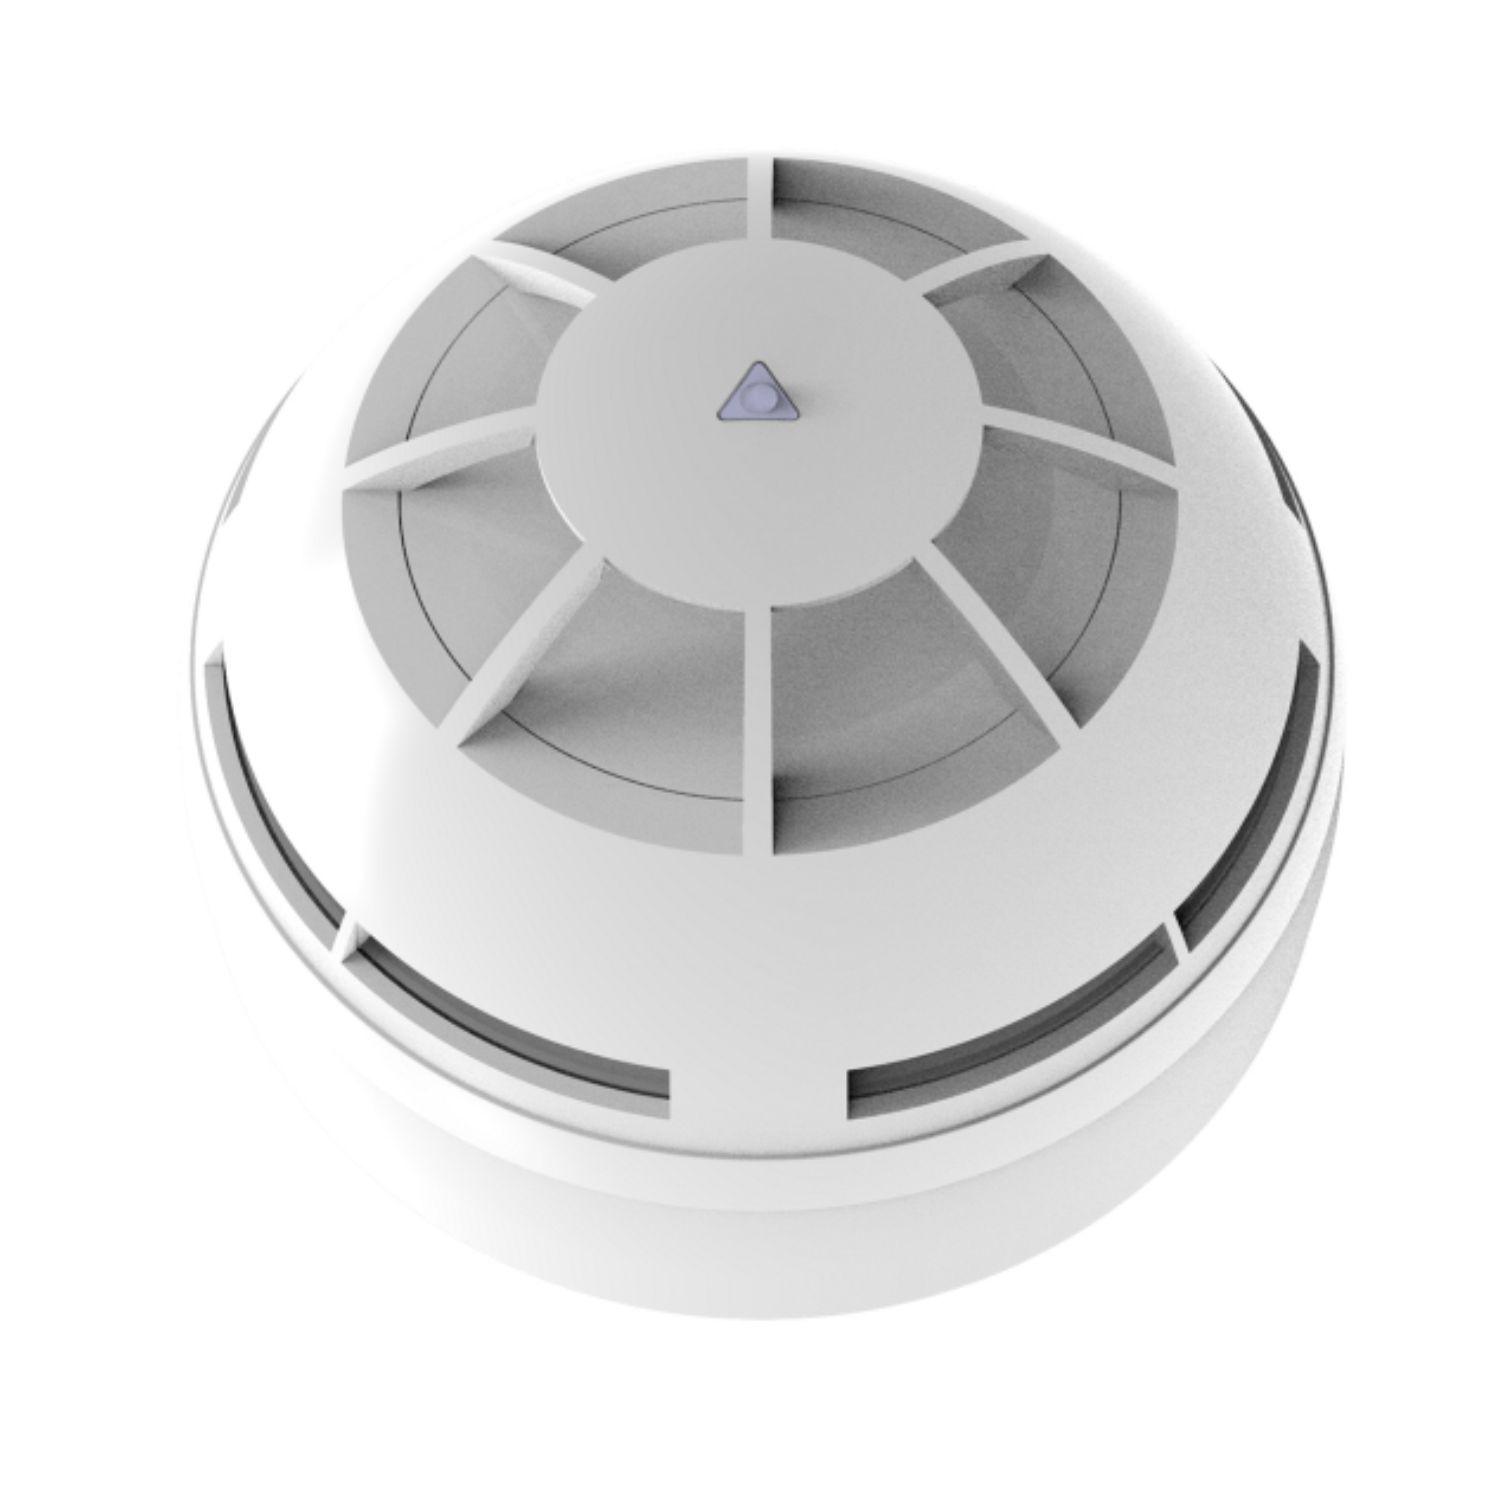 EKHO Hybrid Wireless Heat Sensor